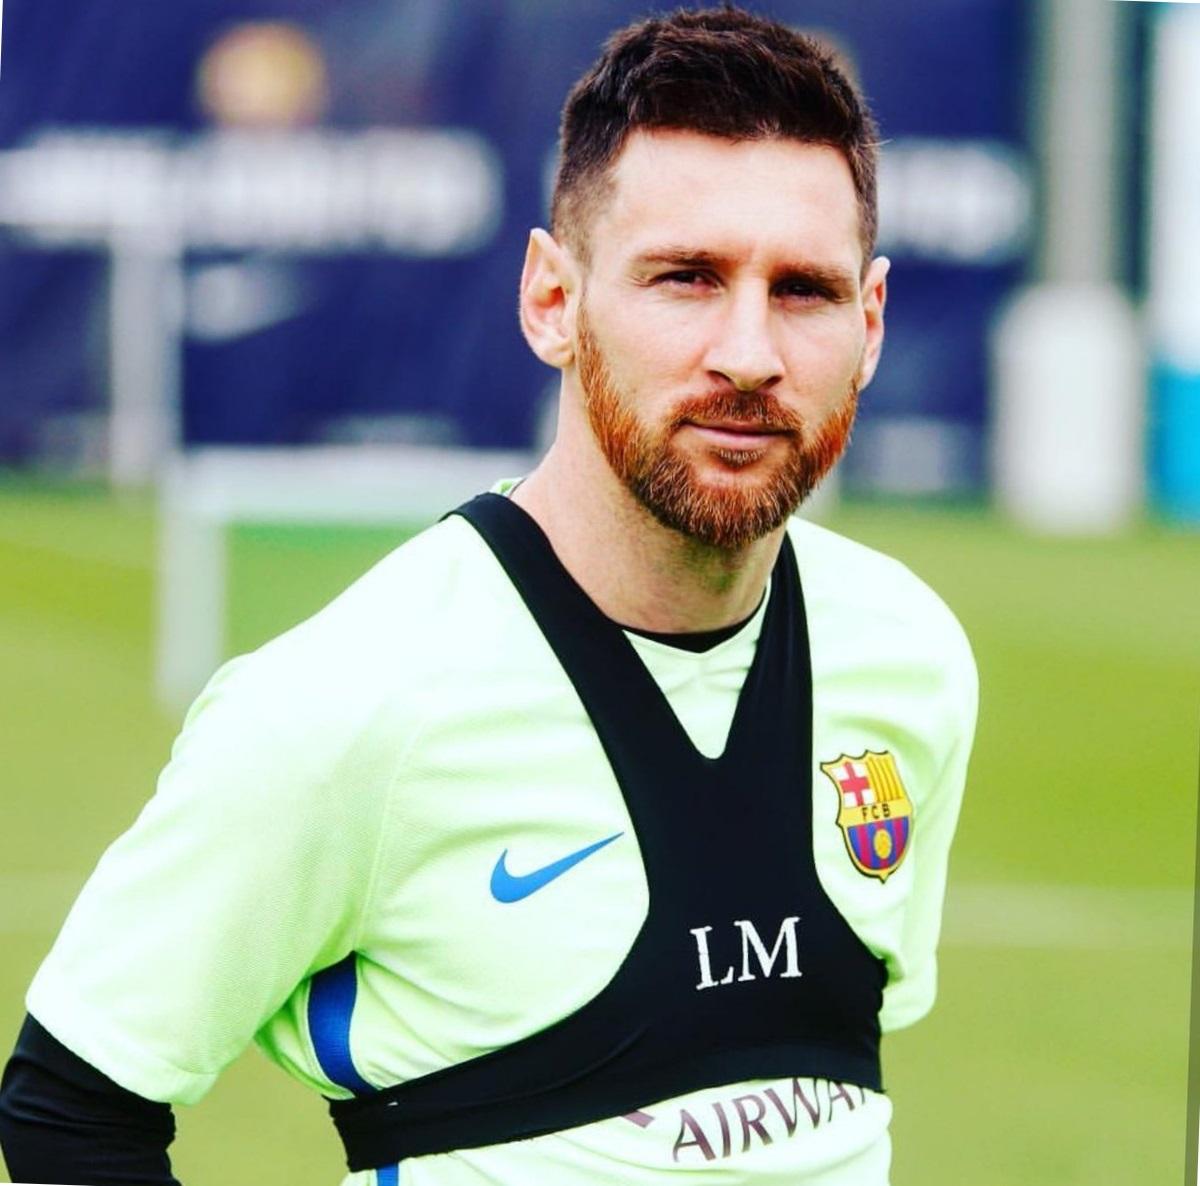 Novaya Pricheska Futbolista Lionelya Messi Obsuzhdenie Na Liveinternet Rossijskij Servis Onlajn Dnevnikov